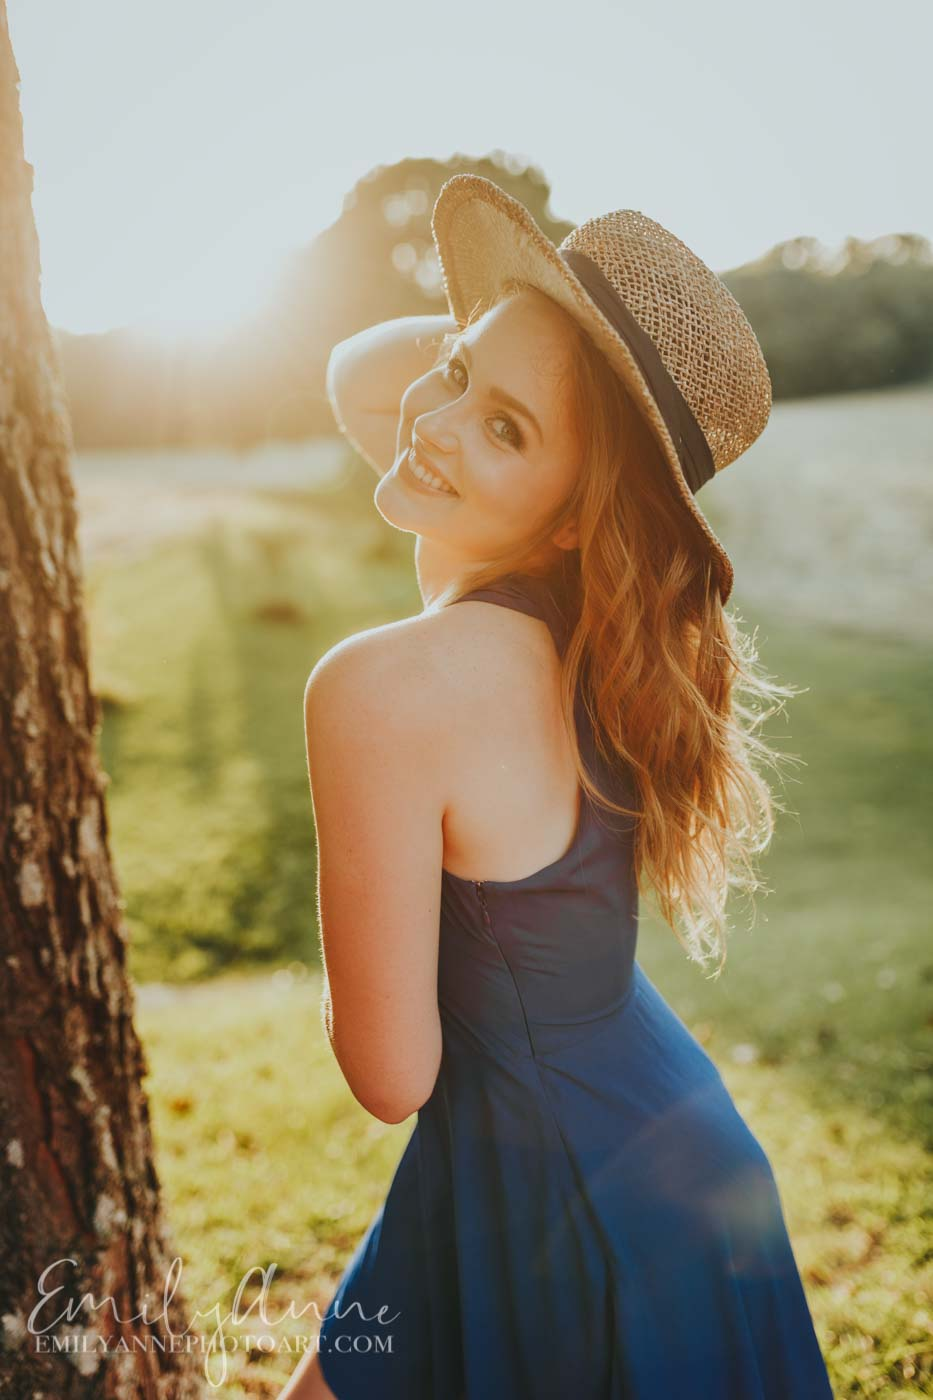 golden gorgeous sunset senior portraits like Anne of green gables by Emily Anne Photo Art